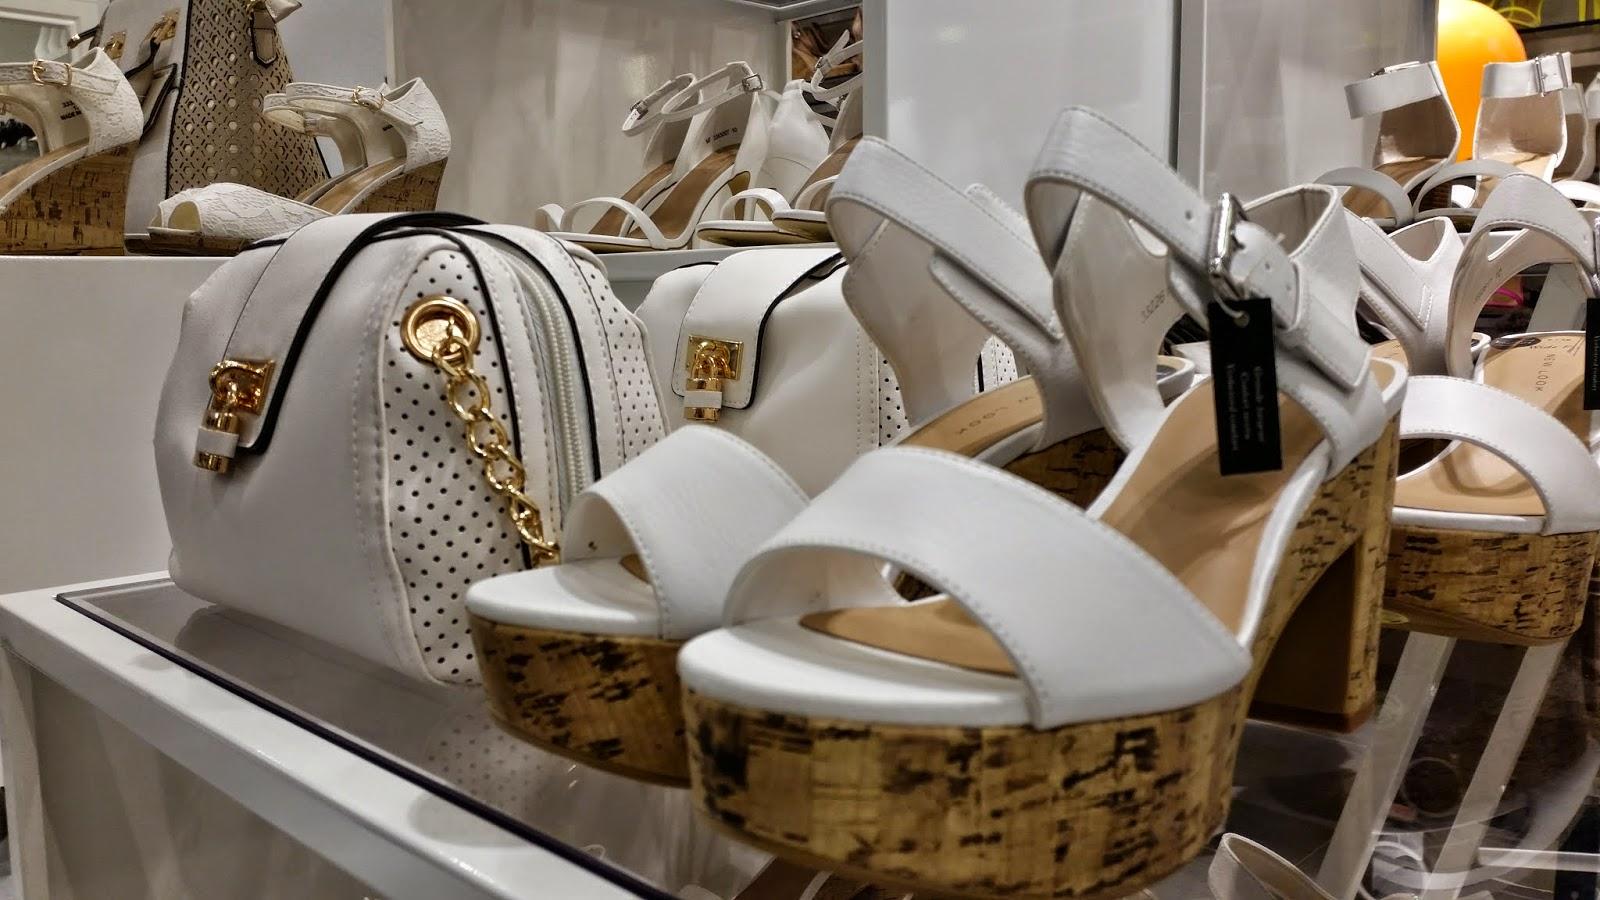 escarpins blanc et liège, sac à main blanc